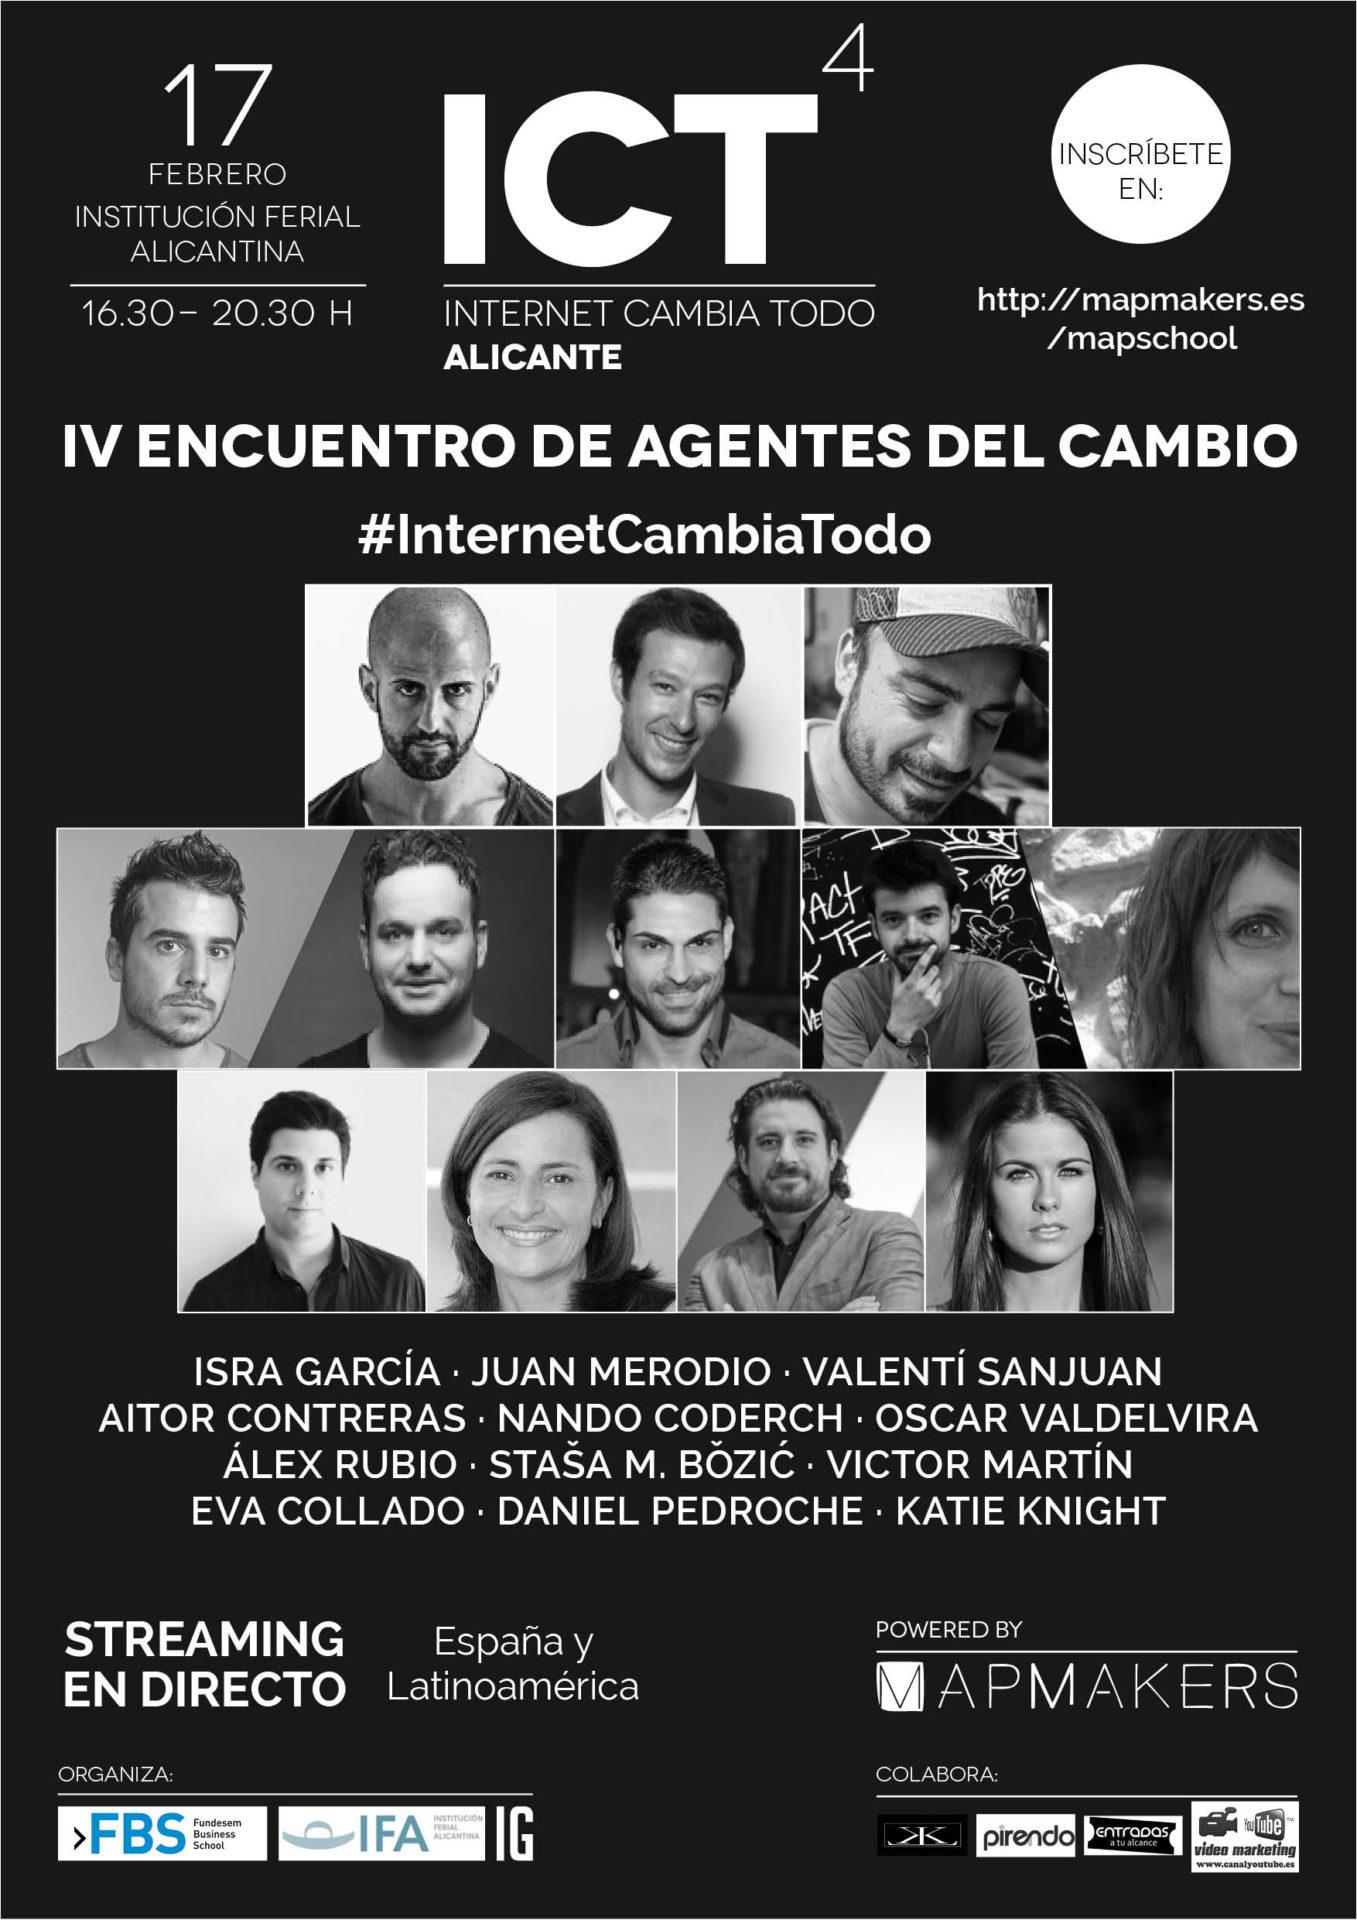 #InternetCambiaTodo elche - alicante